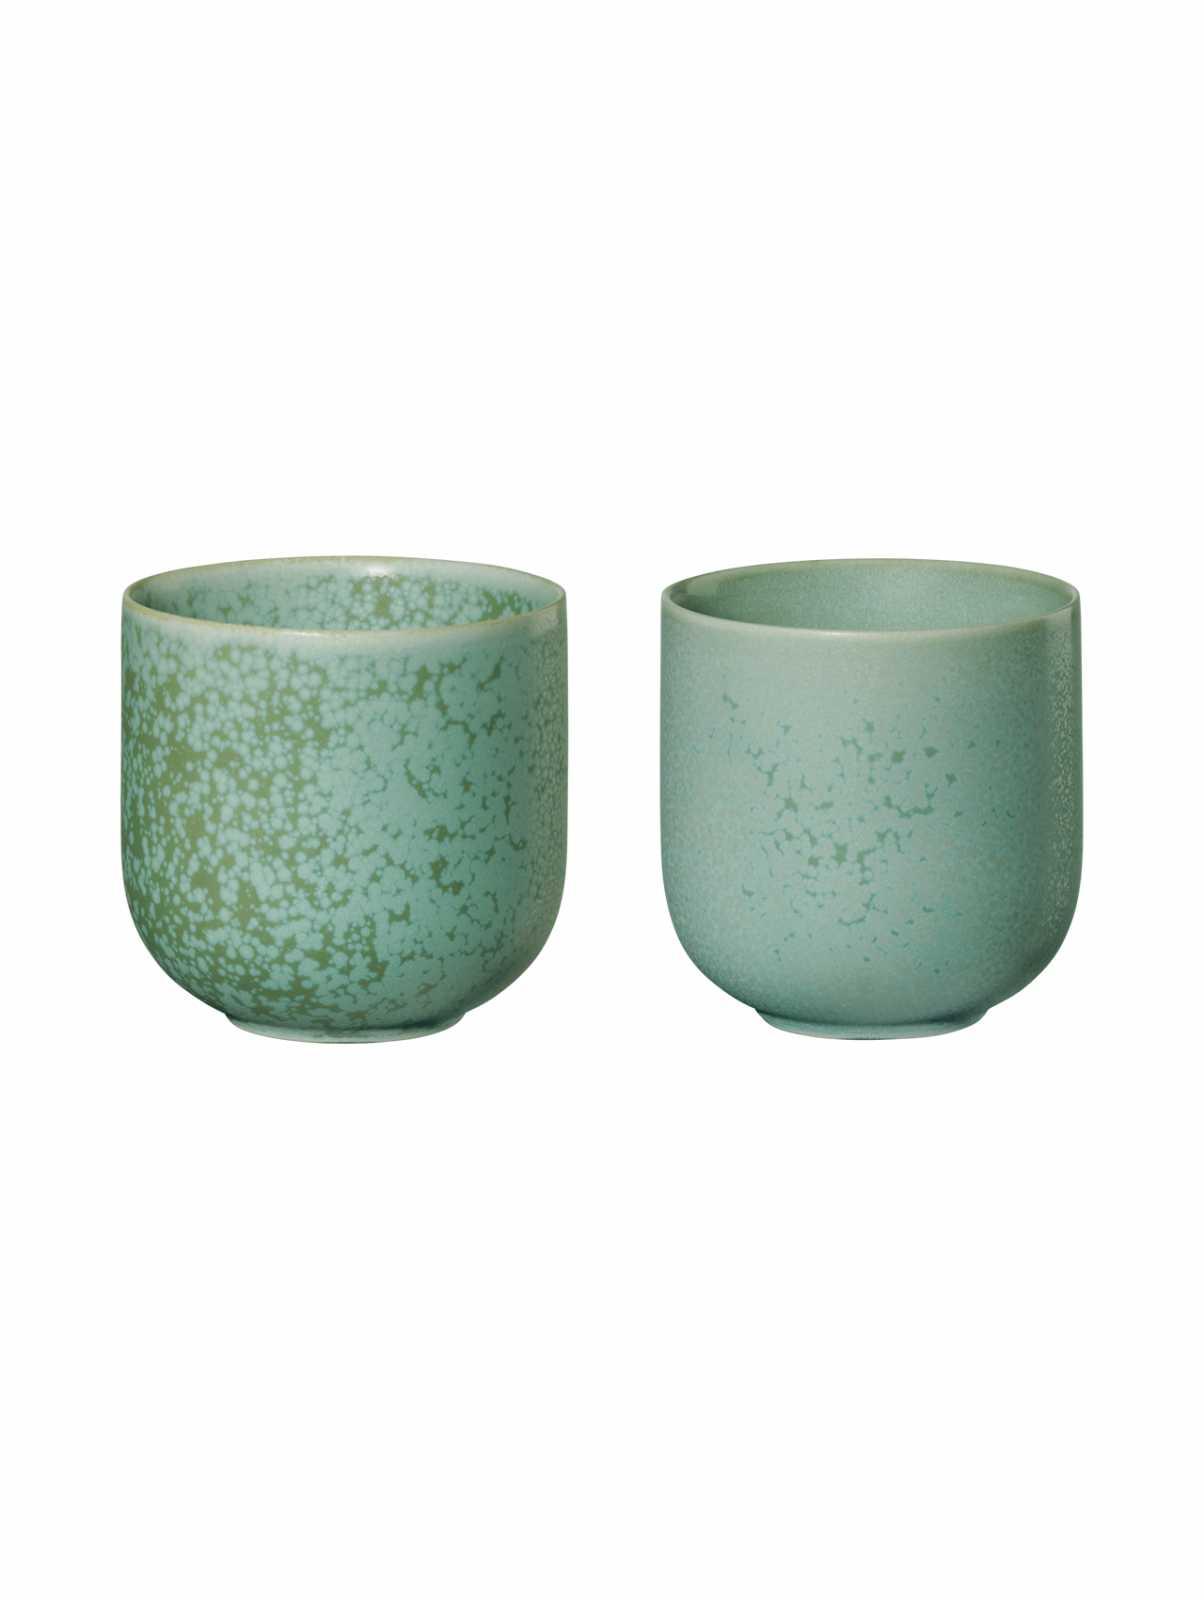 Онлайн каталог PROMENU: Набор фарфоровых чашек  ASA Selection COPPA, объем 0,15 л, 2 шт, ментоловый  19081191